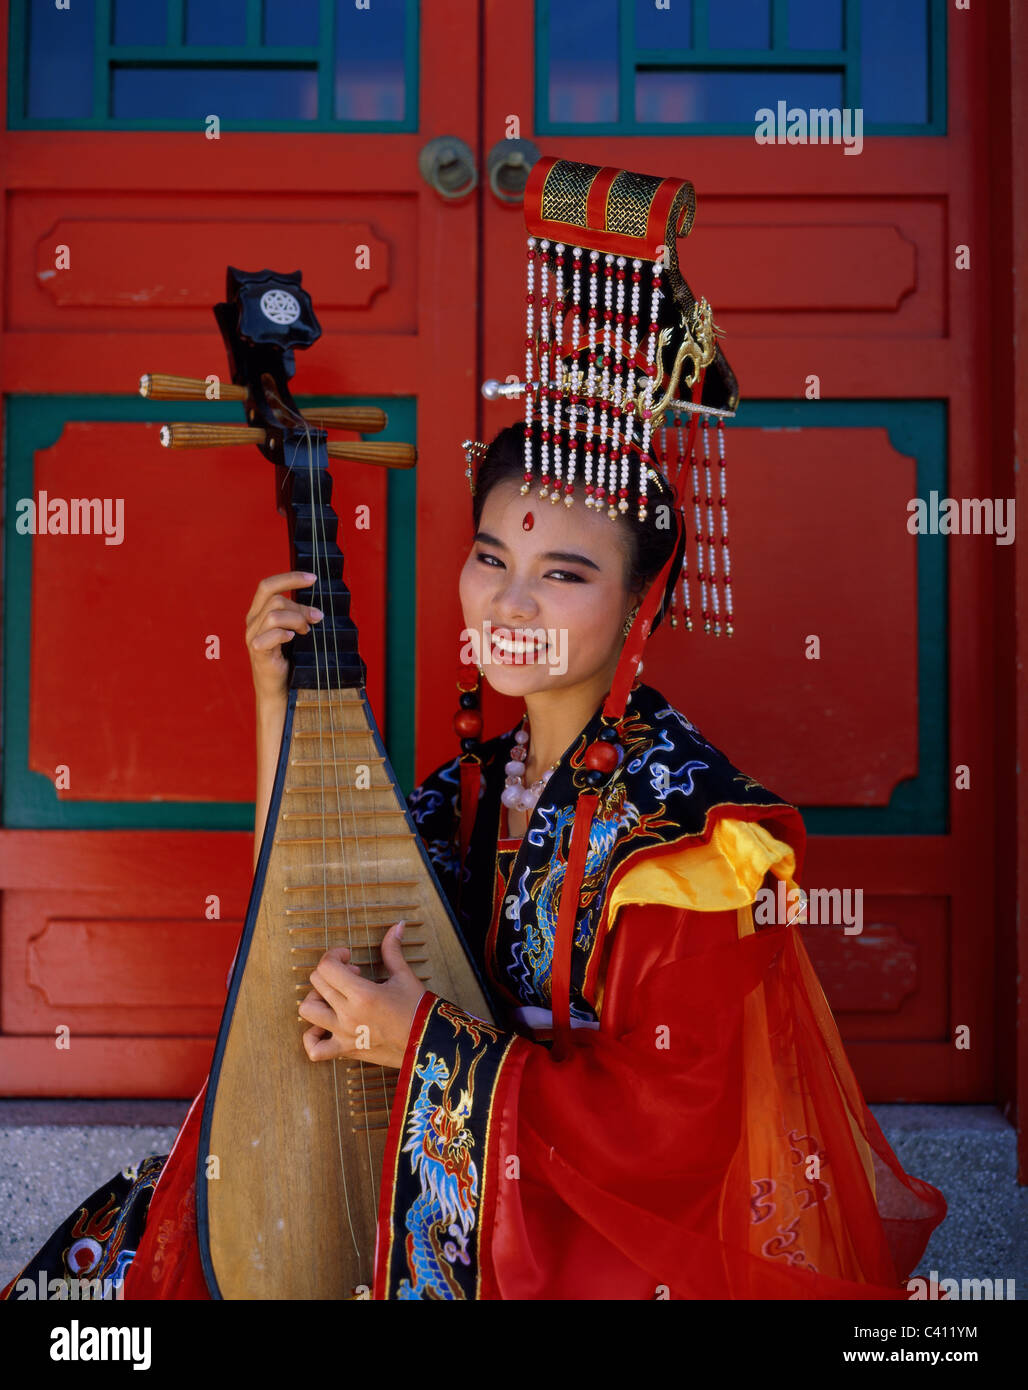 Asia, Beijing, Peking, China, Holiday, Landmark, Lute, Model, Musical instrument, Playing, Released, String, Three, - Stock Image